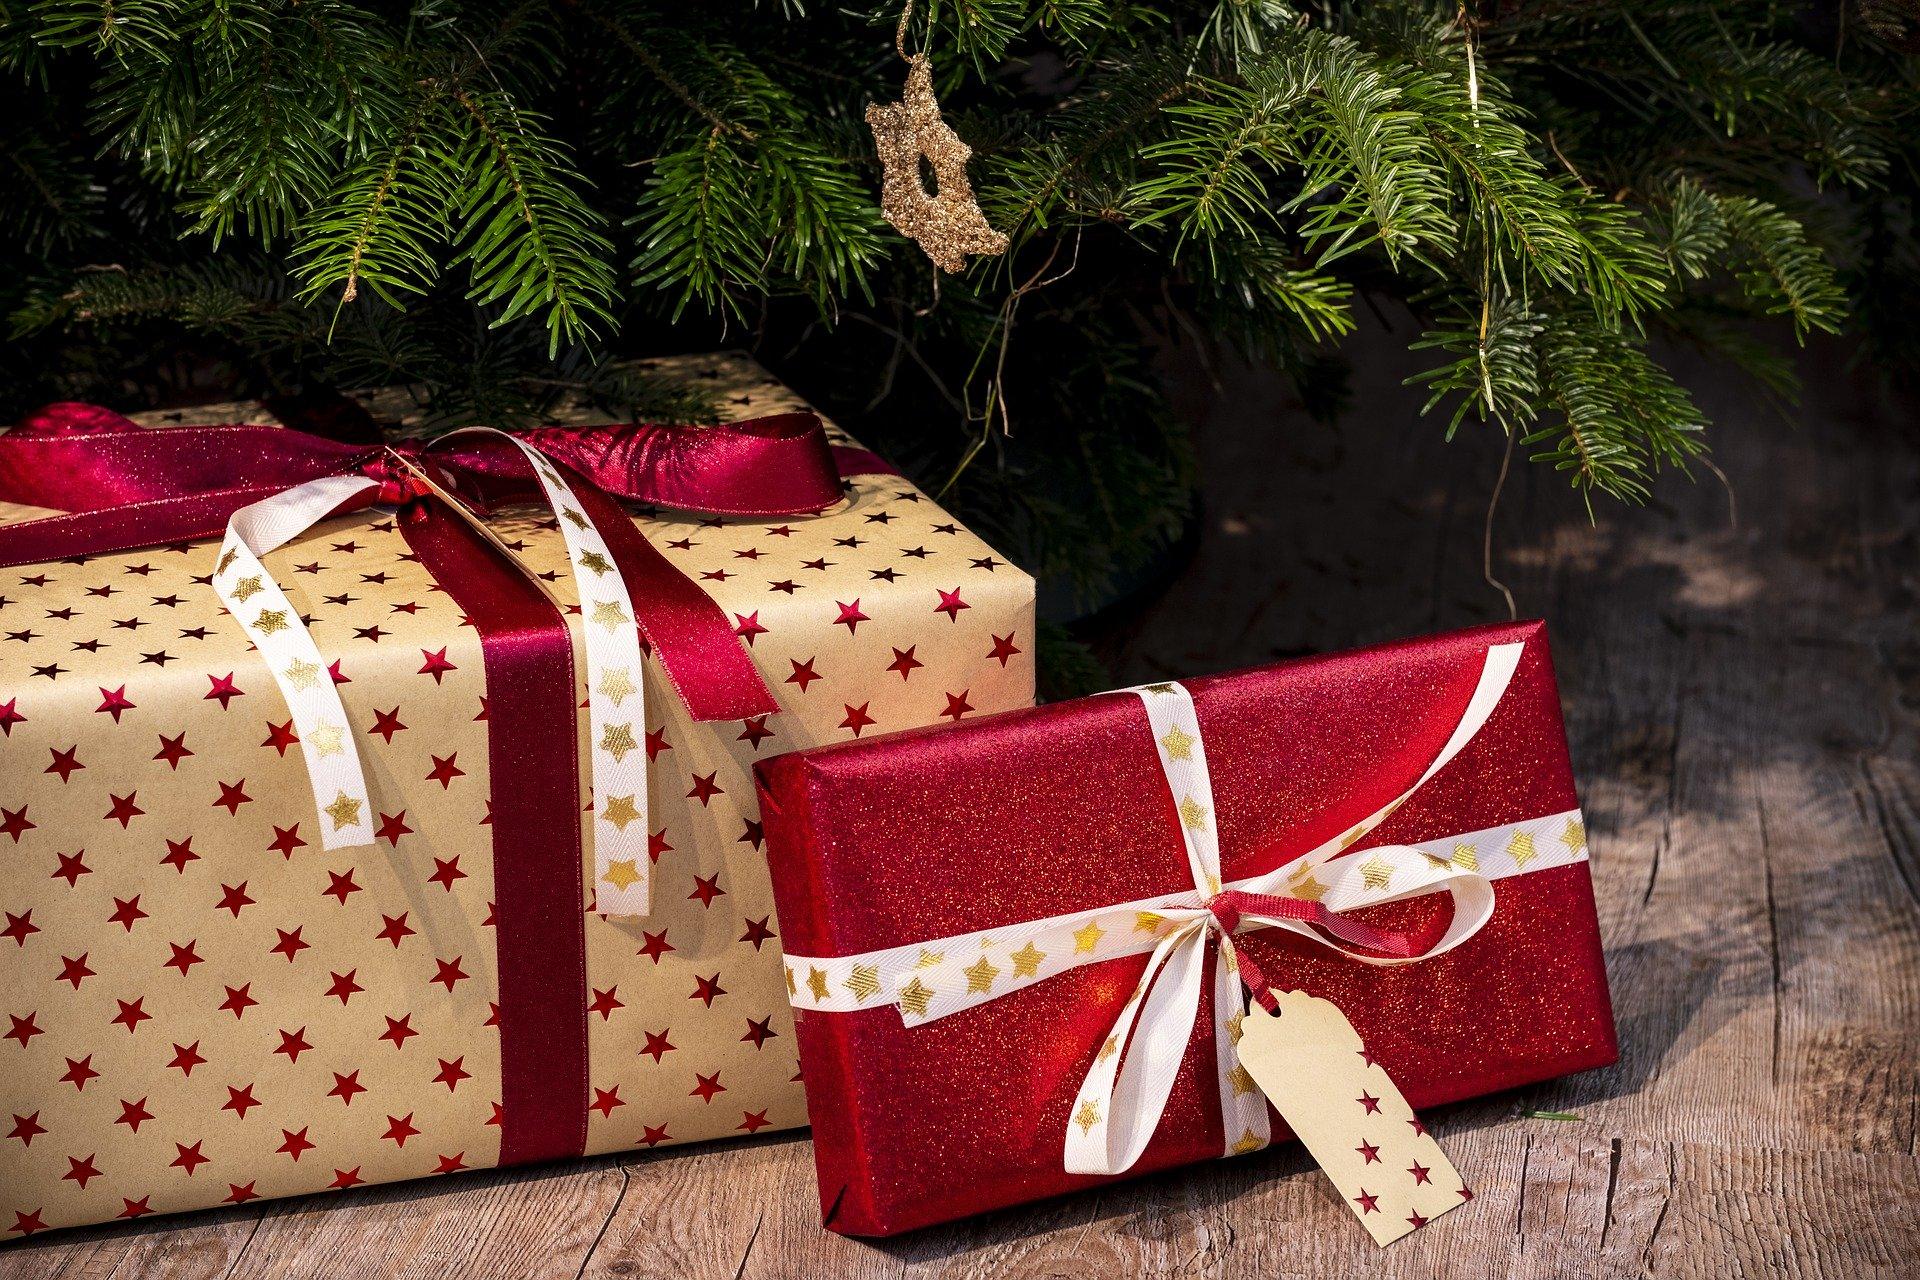 Leicester lie detector test, Christmas burglary, theft, Leicester polygraph test